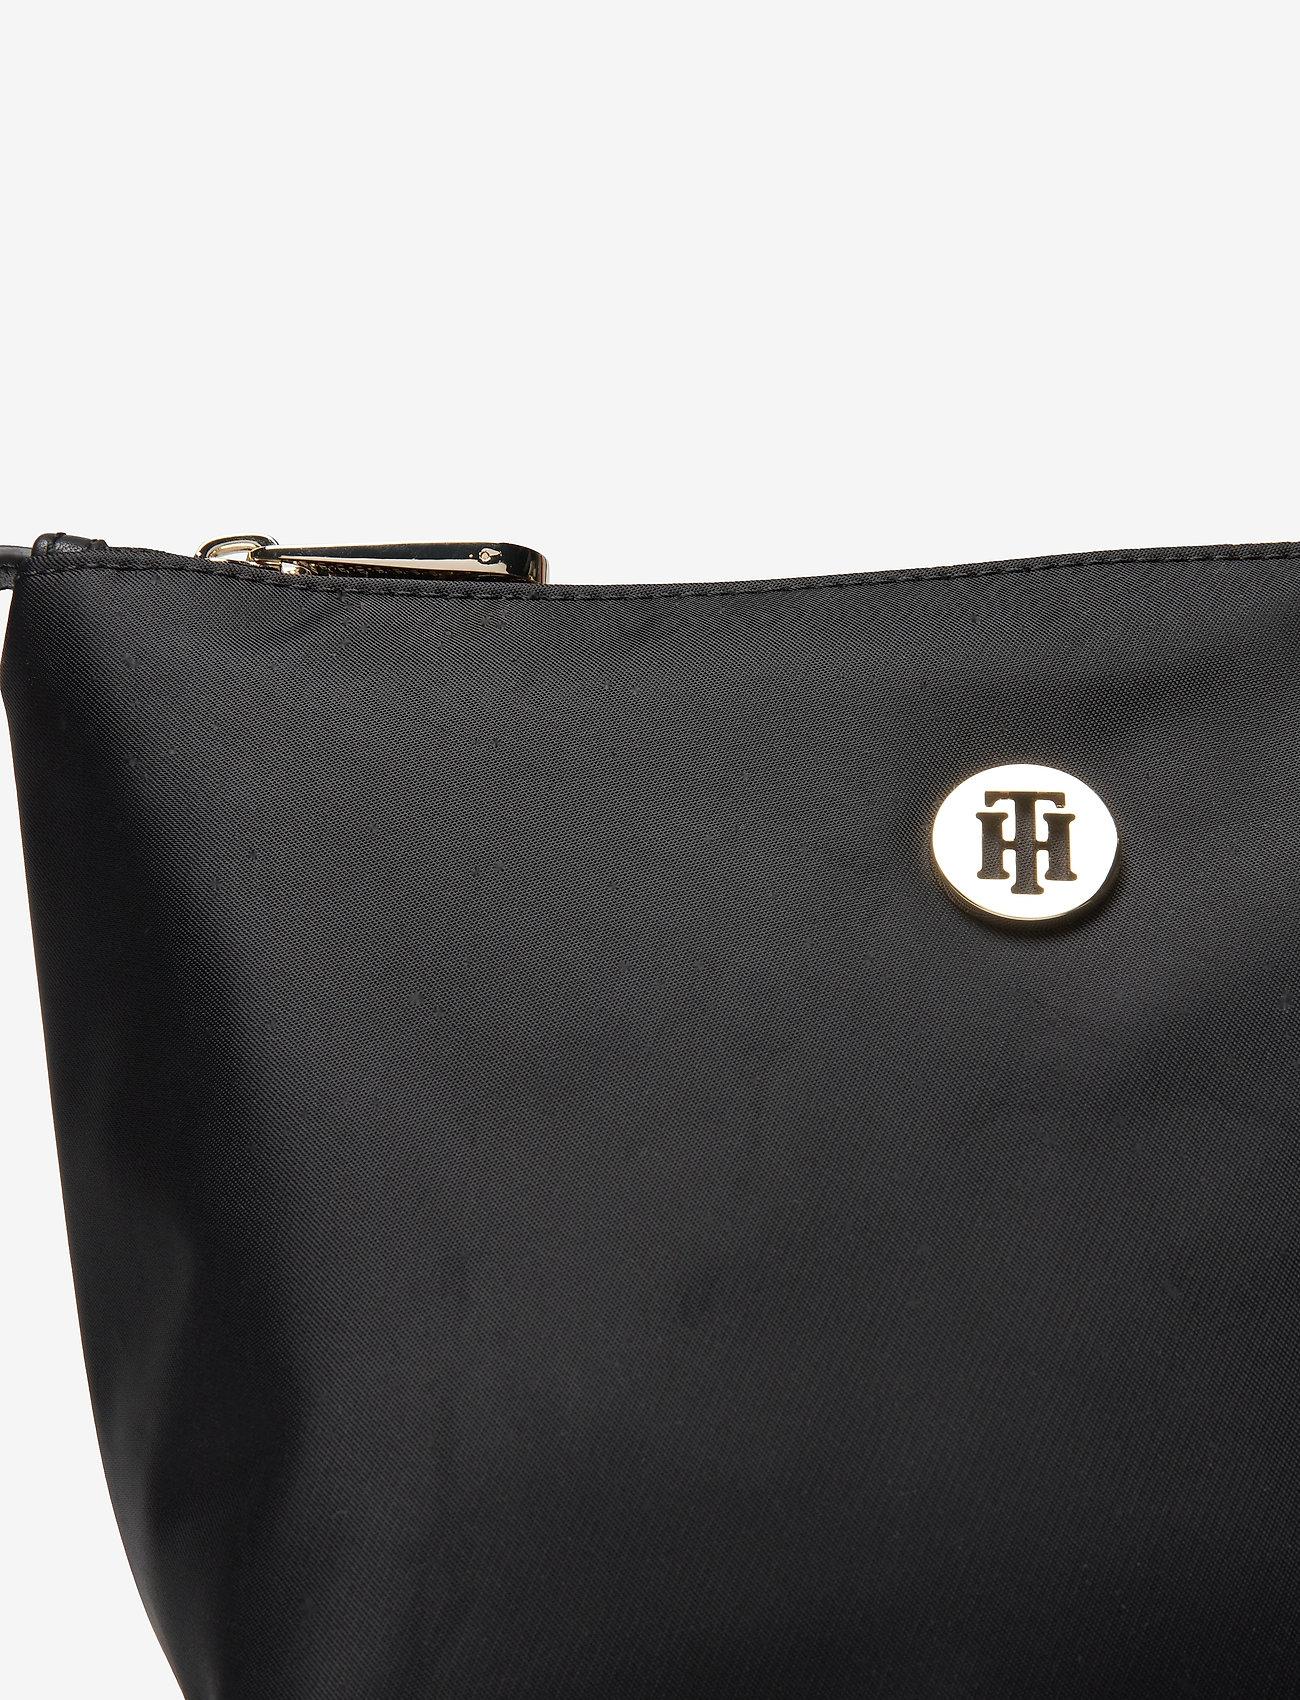 Tommy Hilfiger - POPPY WASHBAG - cosmetic bags - black - 3